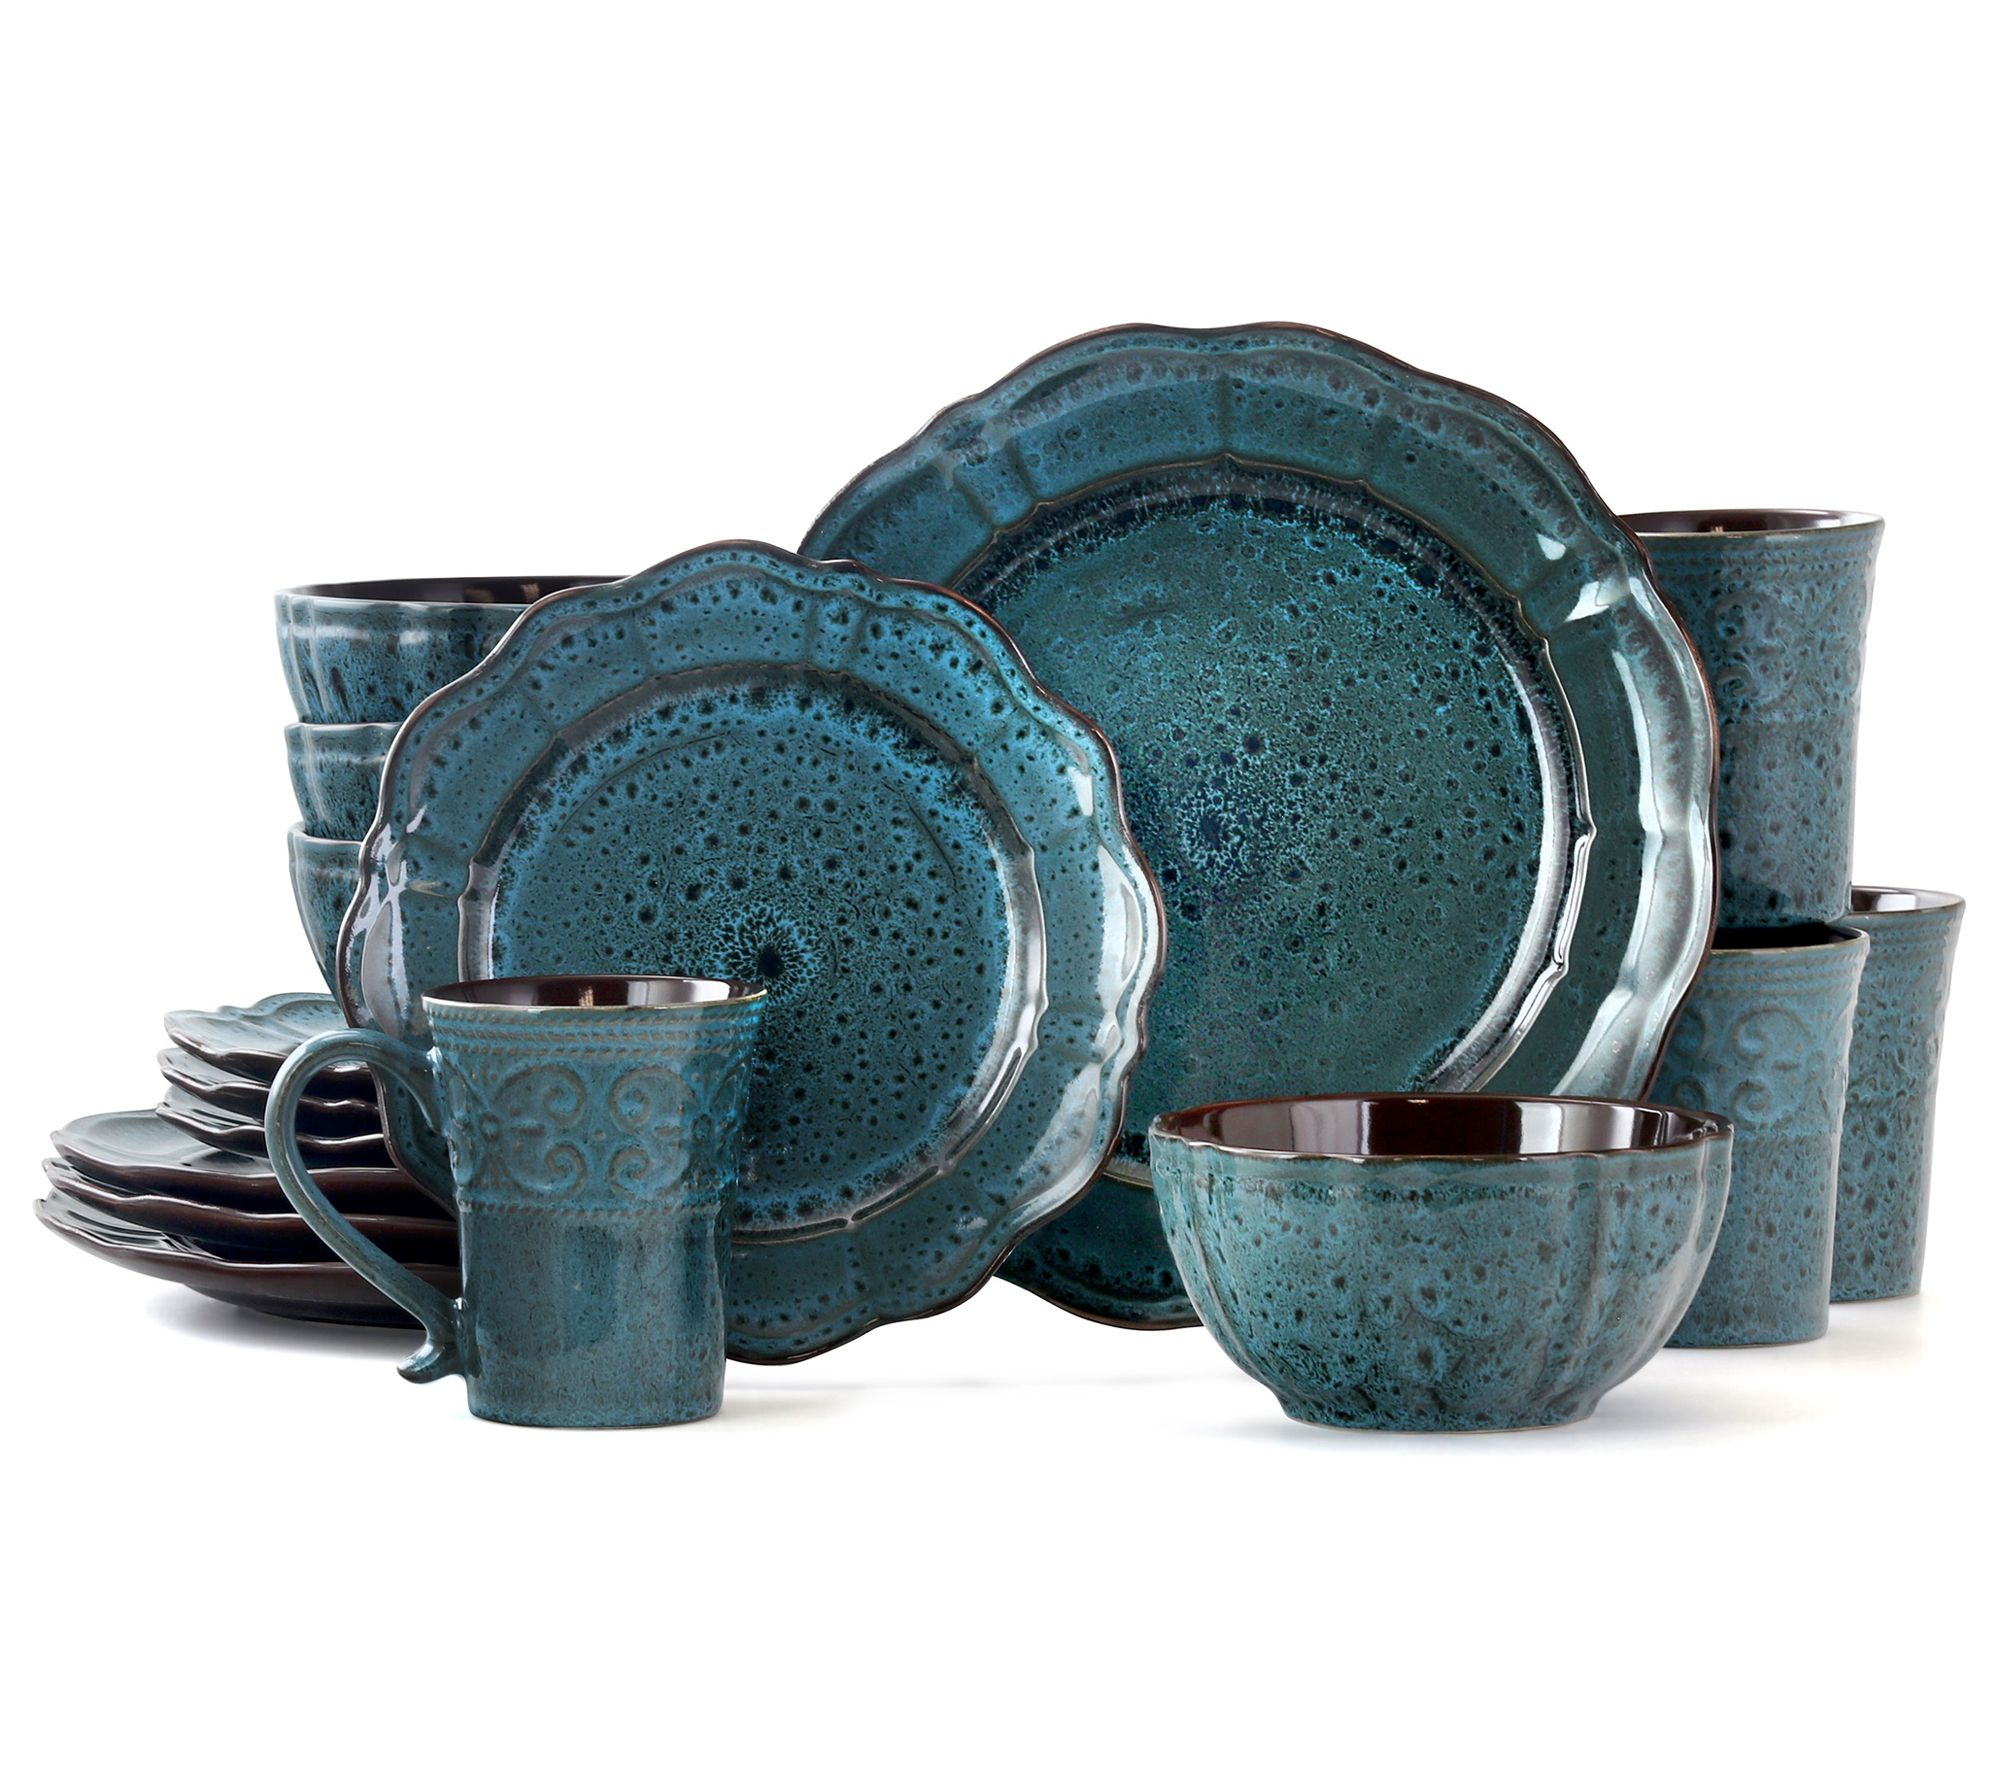 Elama Lavish Blue 16 Piece Stoneware Dinnerwareset Qvc Com